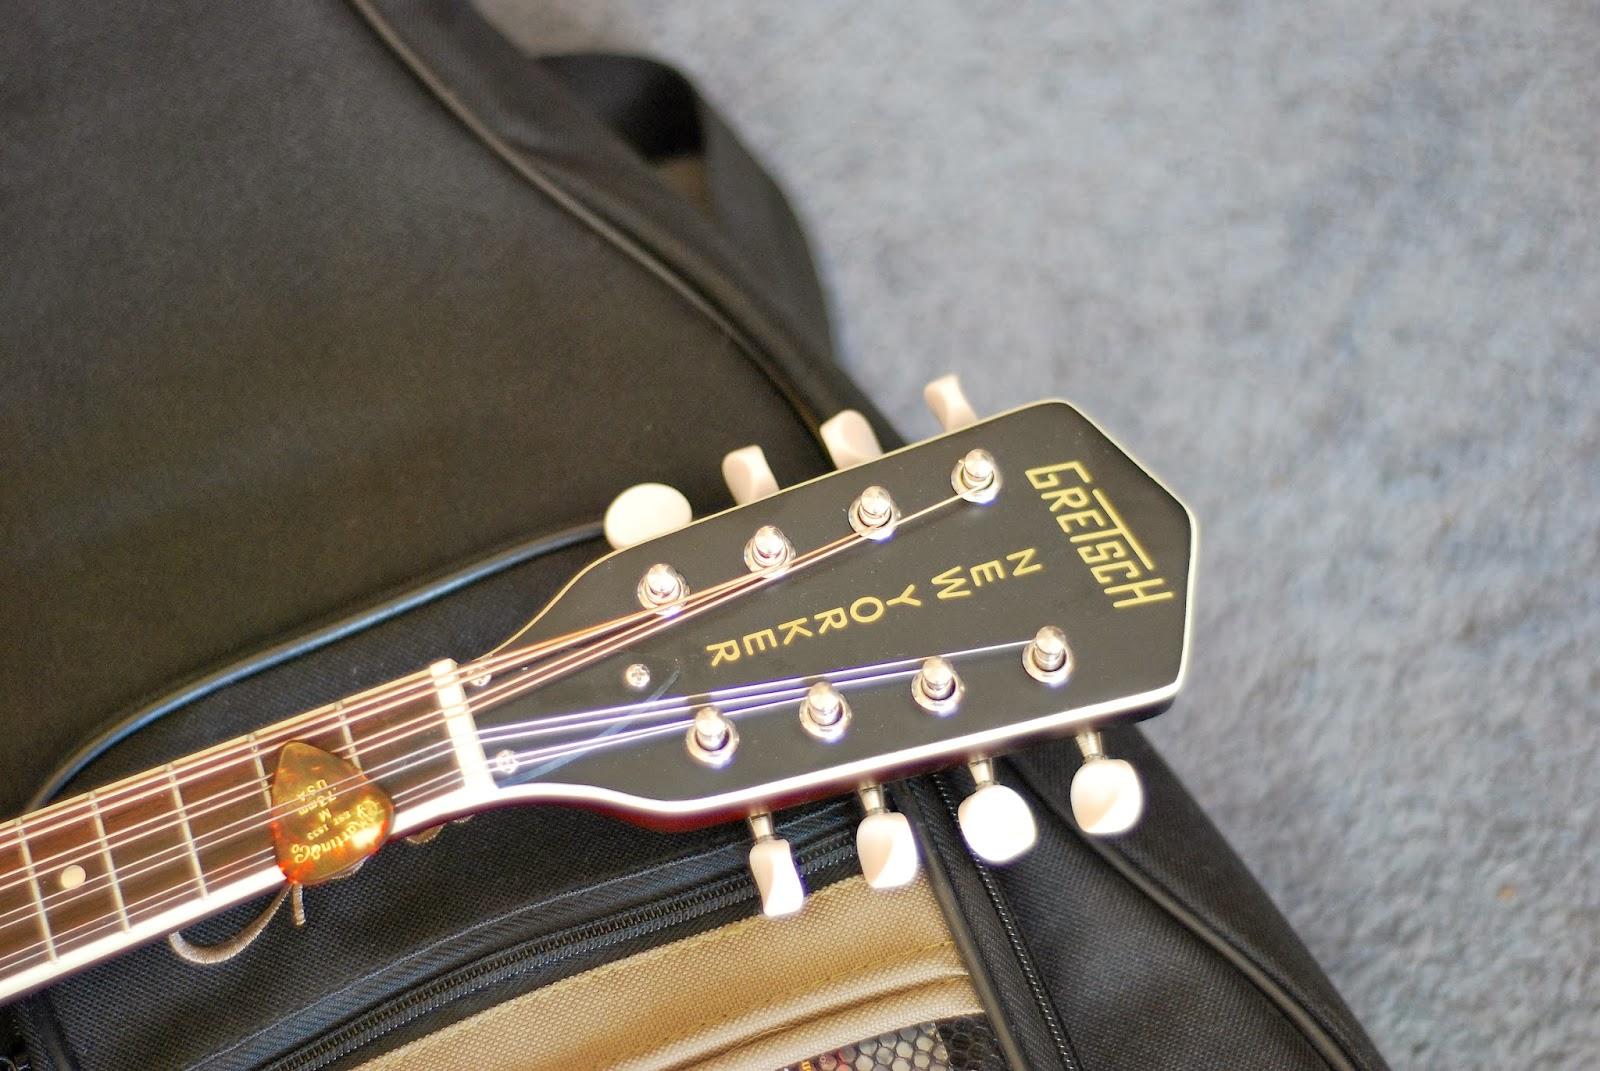 Gretsch G9320 headstock